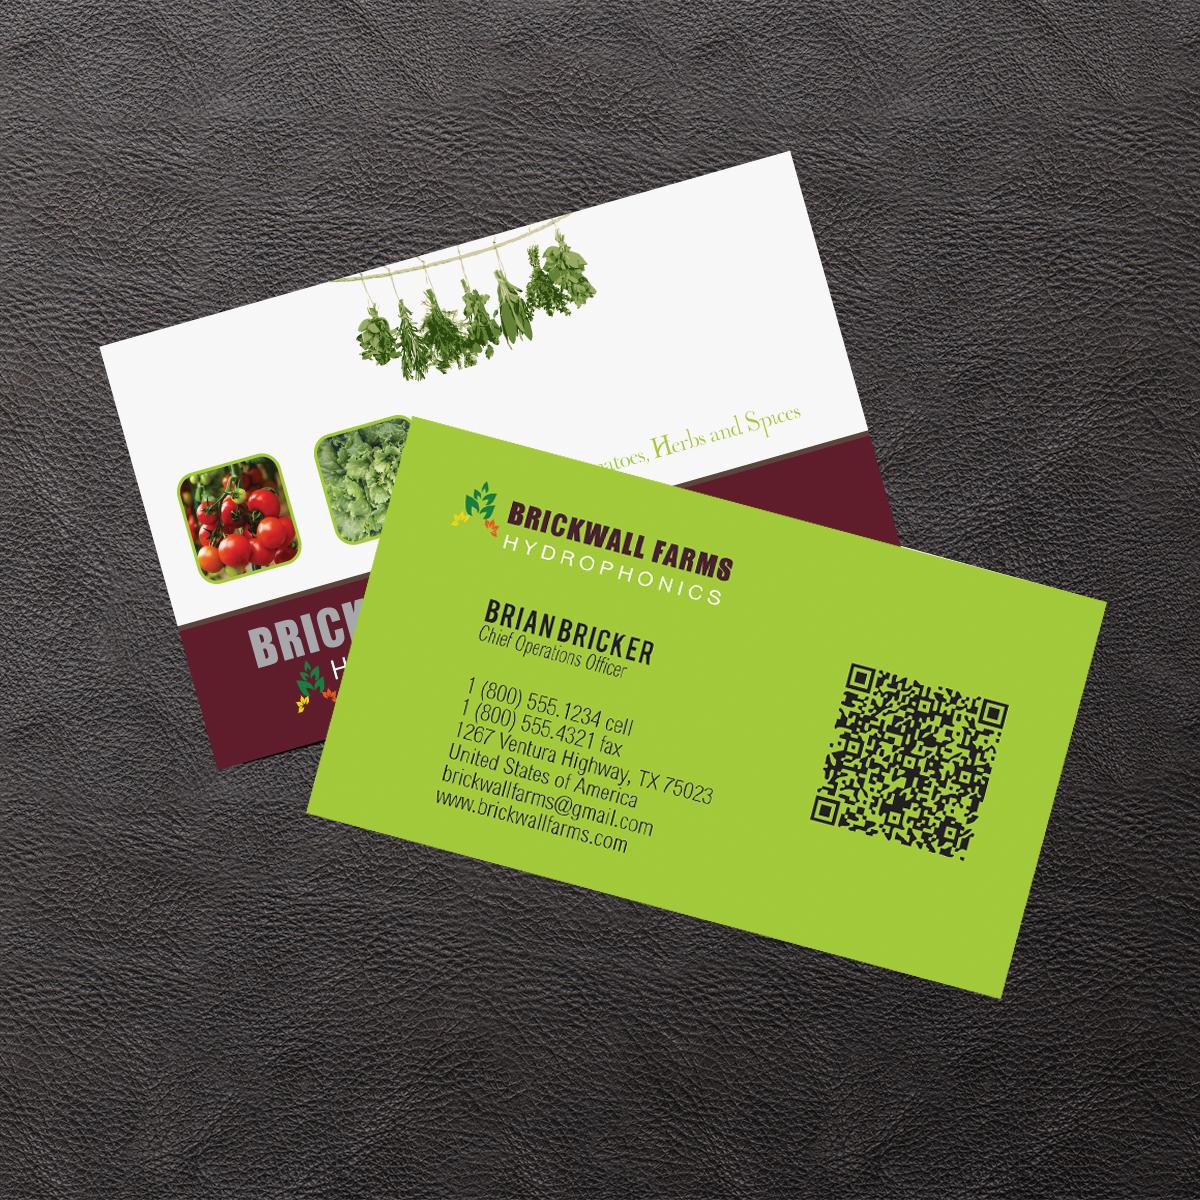 Business Card Design for Brian Bricker by Venus L. Penaflor | Design ...